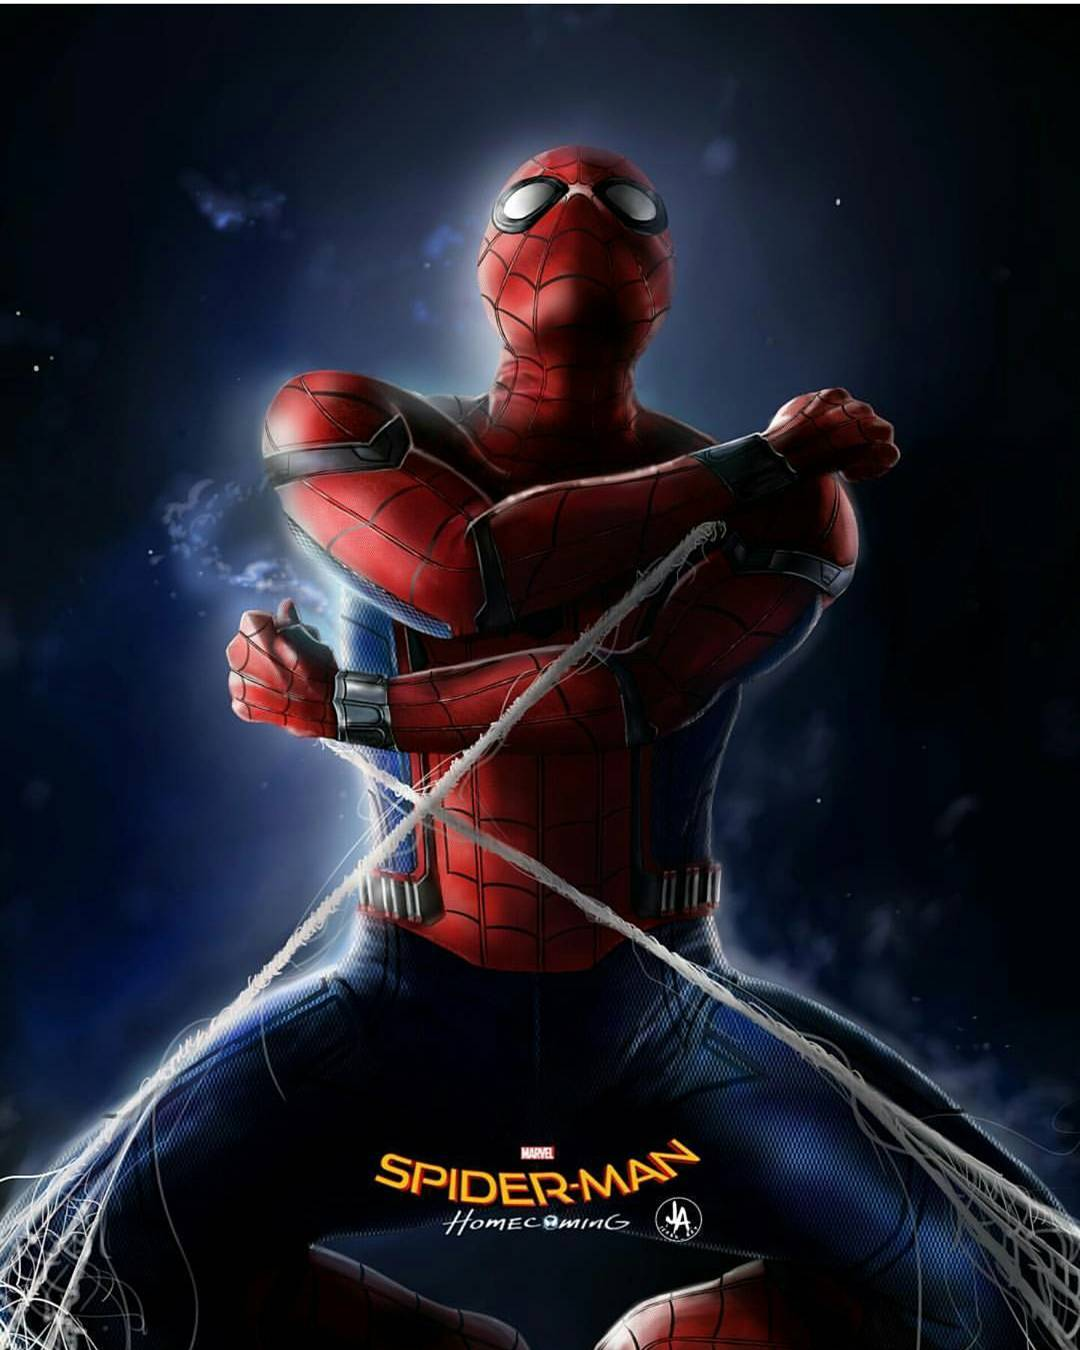 Spiderman Homecoming Wallpaper